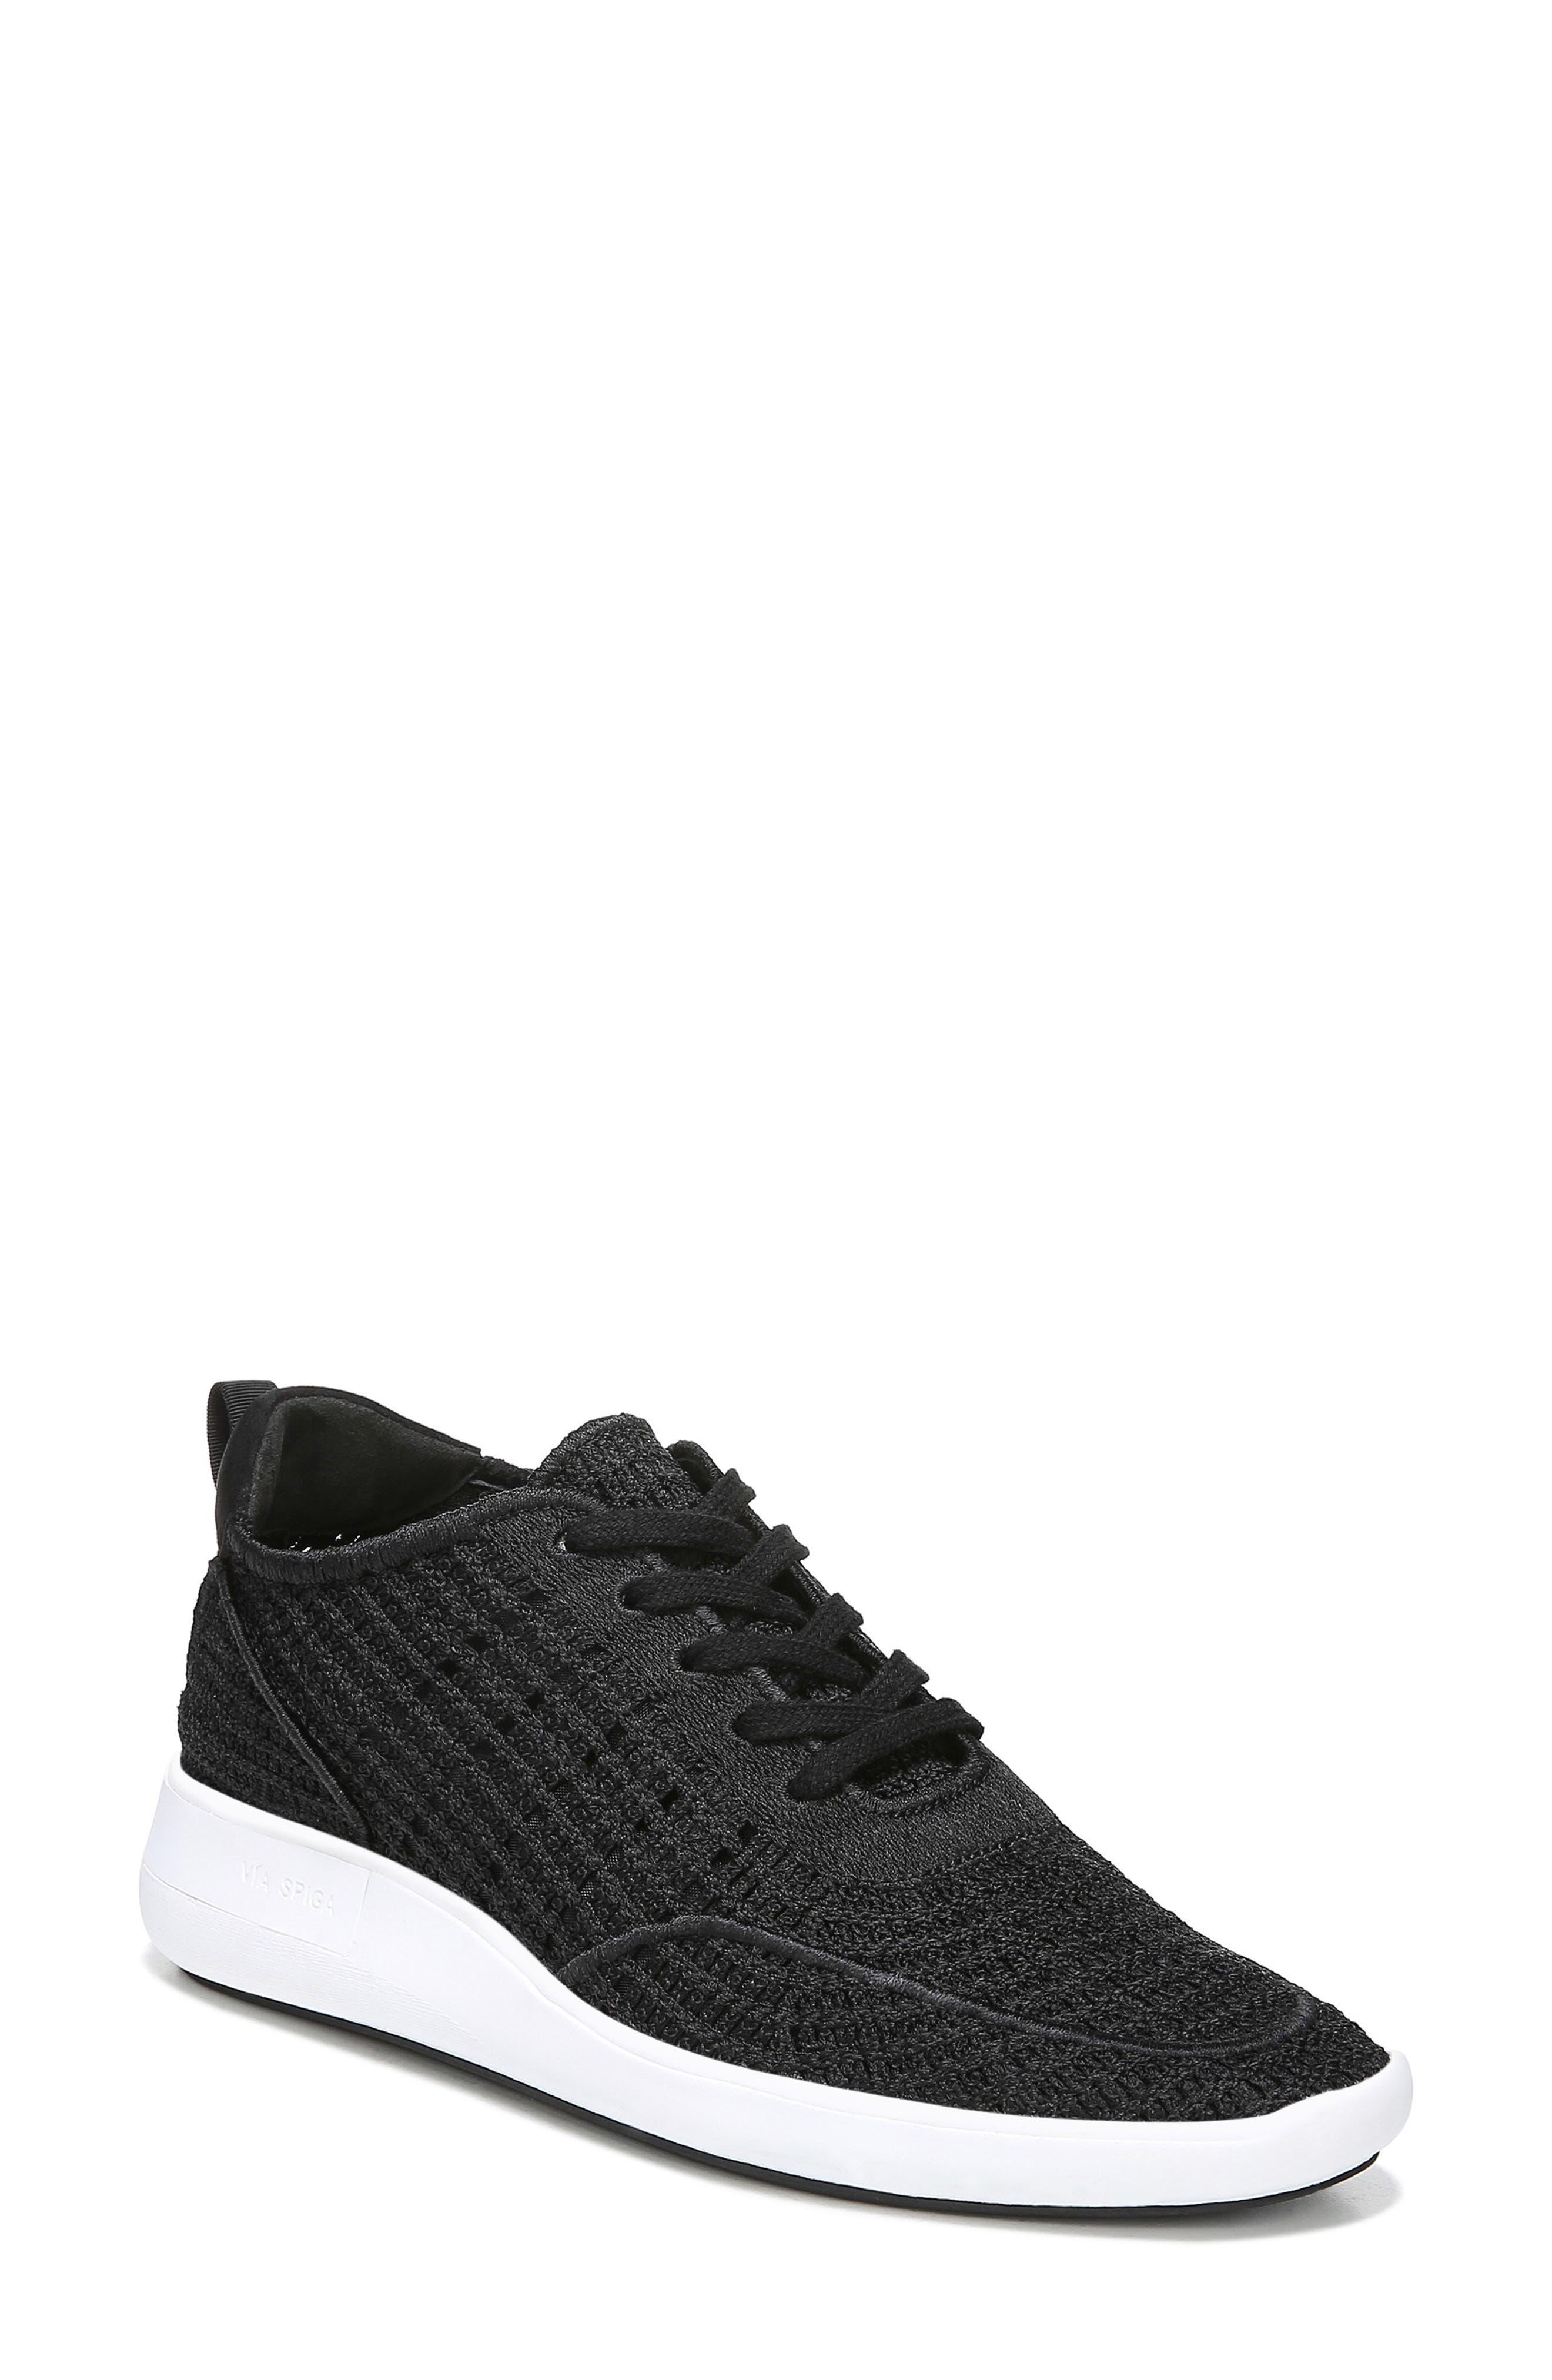 Via Spiga Macra Woven Sneaker, Black